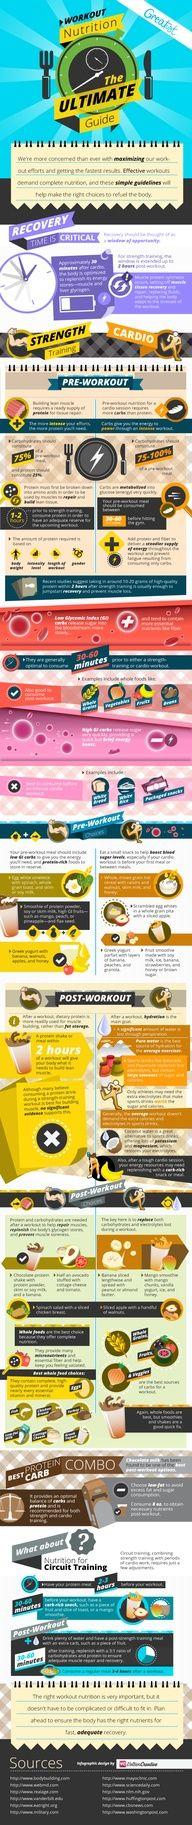 Workout food help